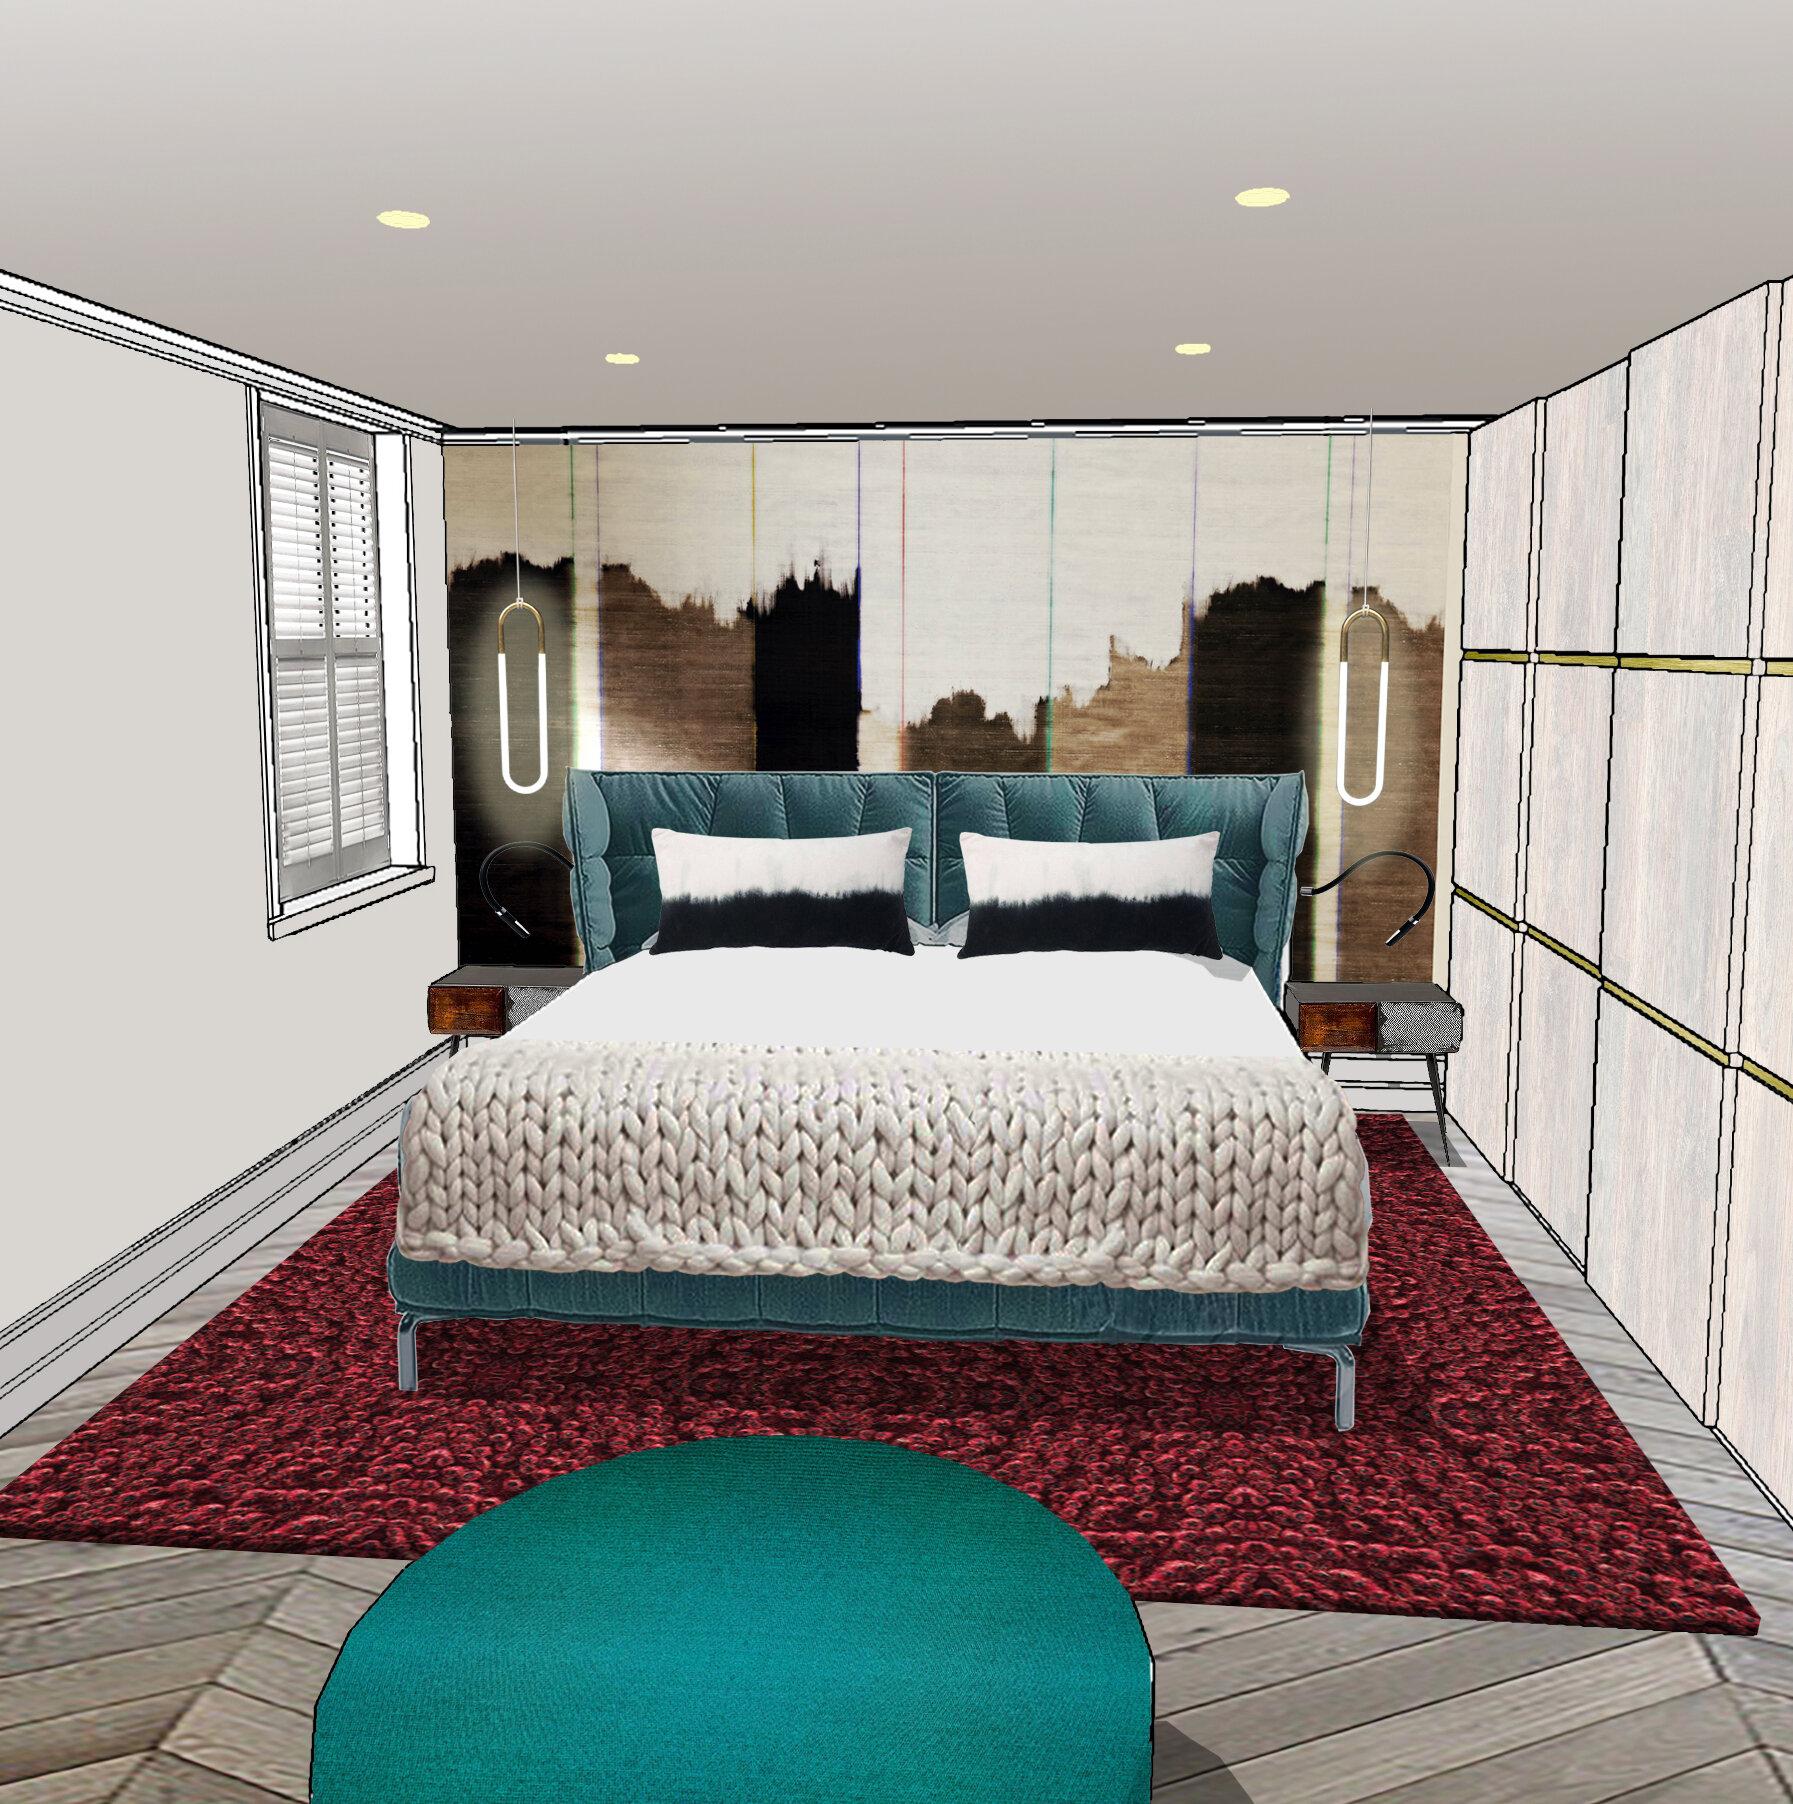 lottacoledesign-master bedroom.jpg